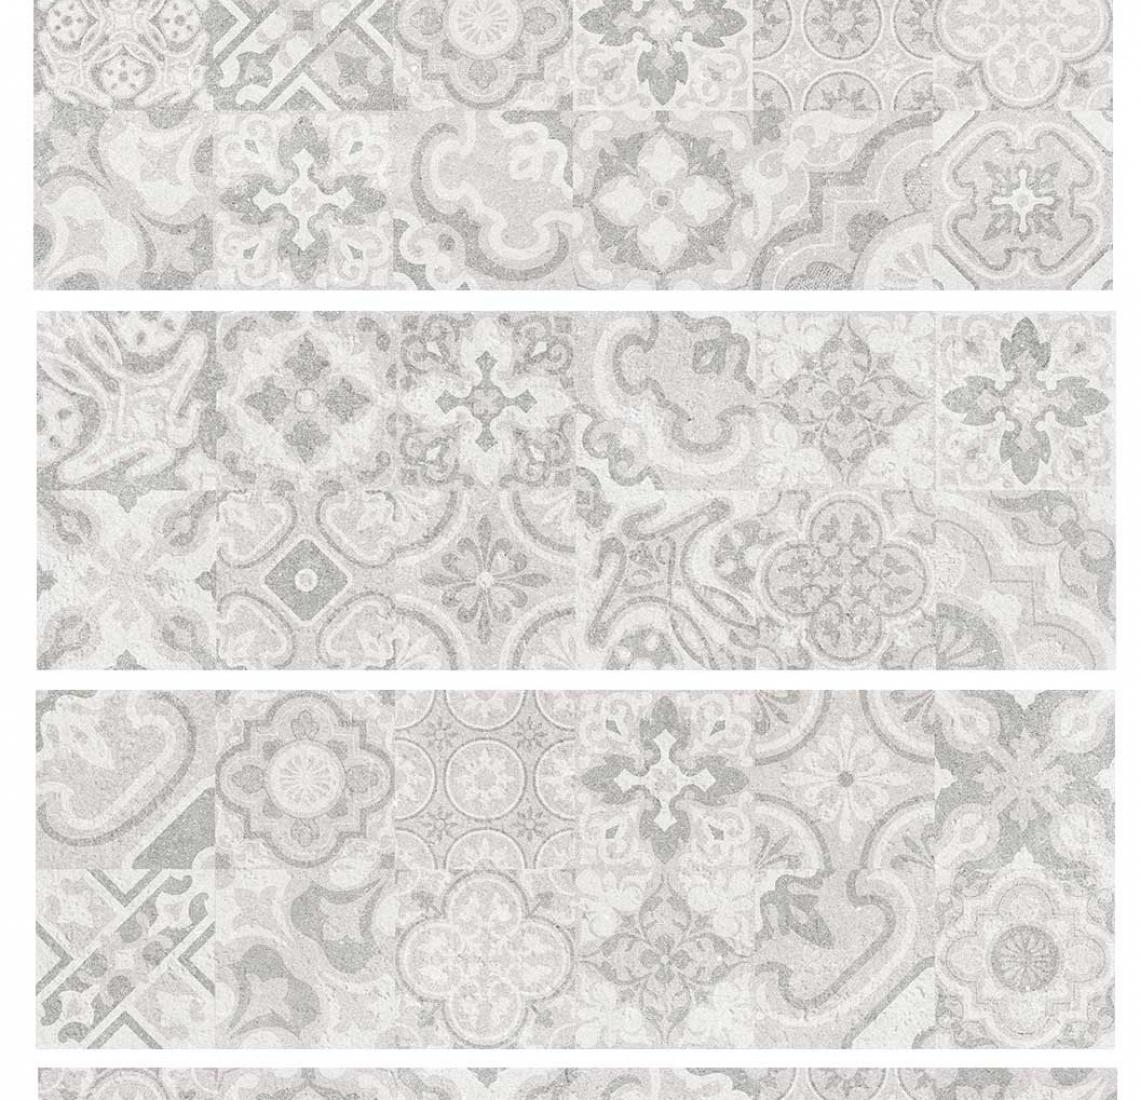 faianta-decorativa-patchwork